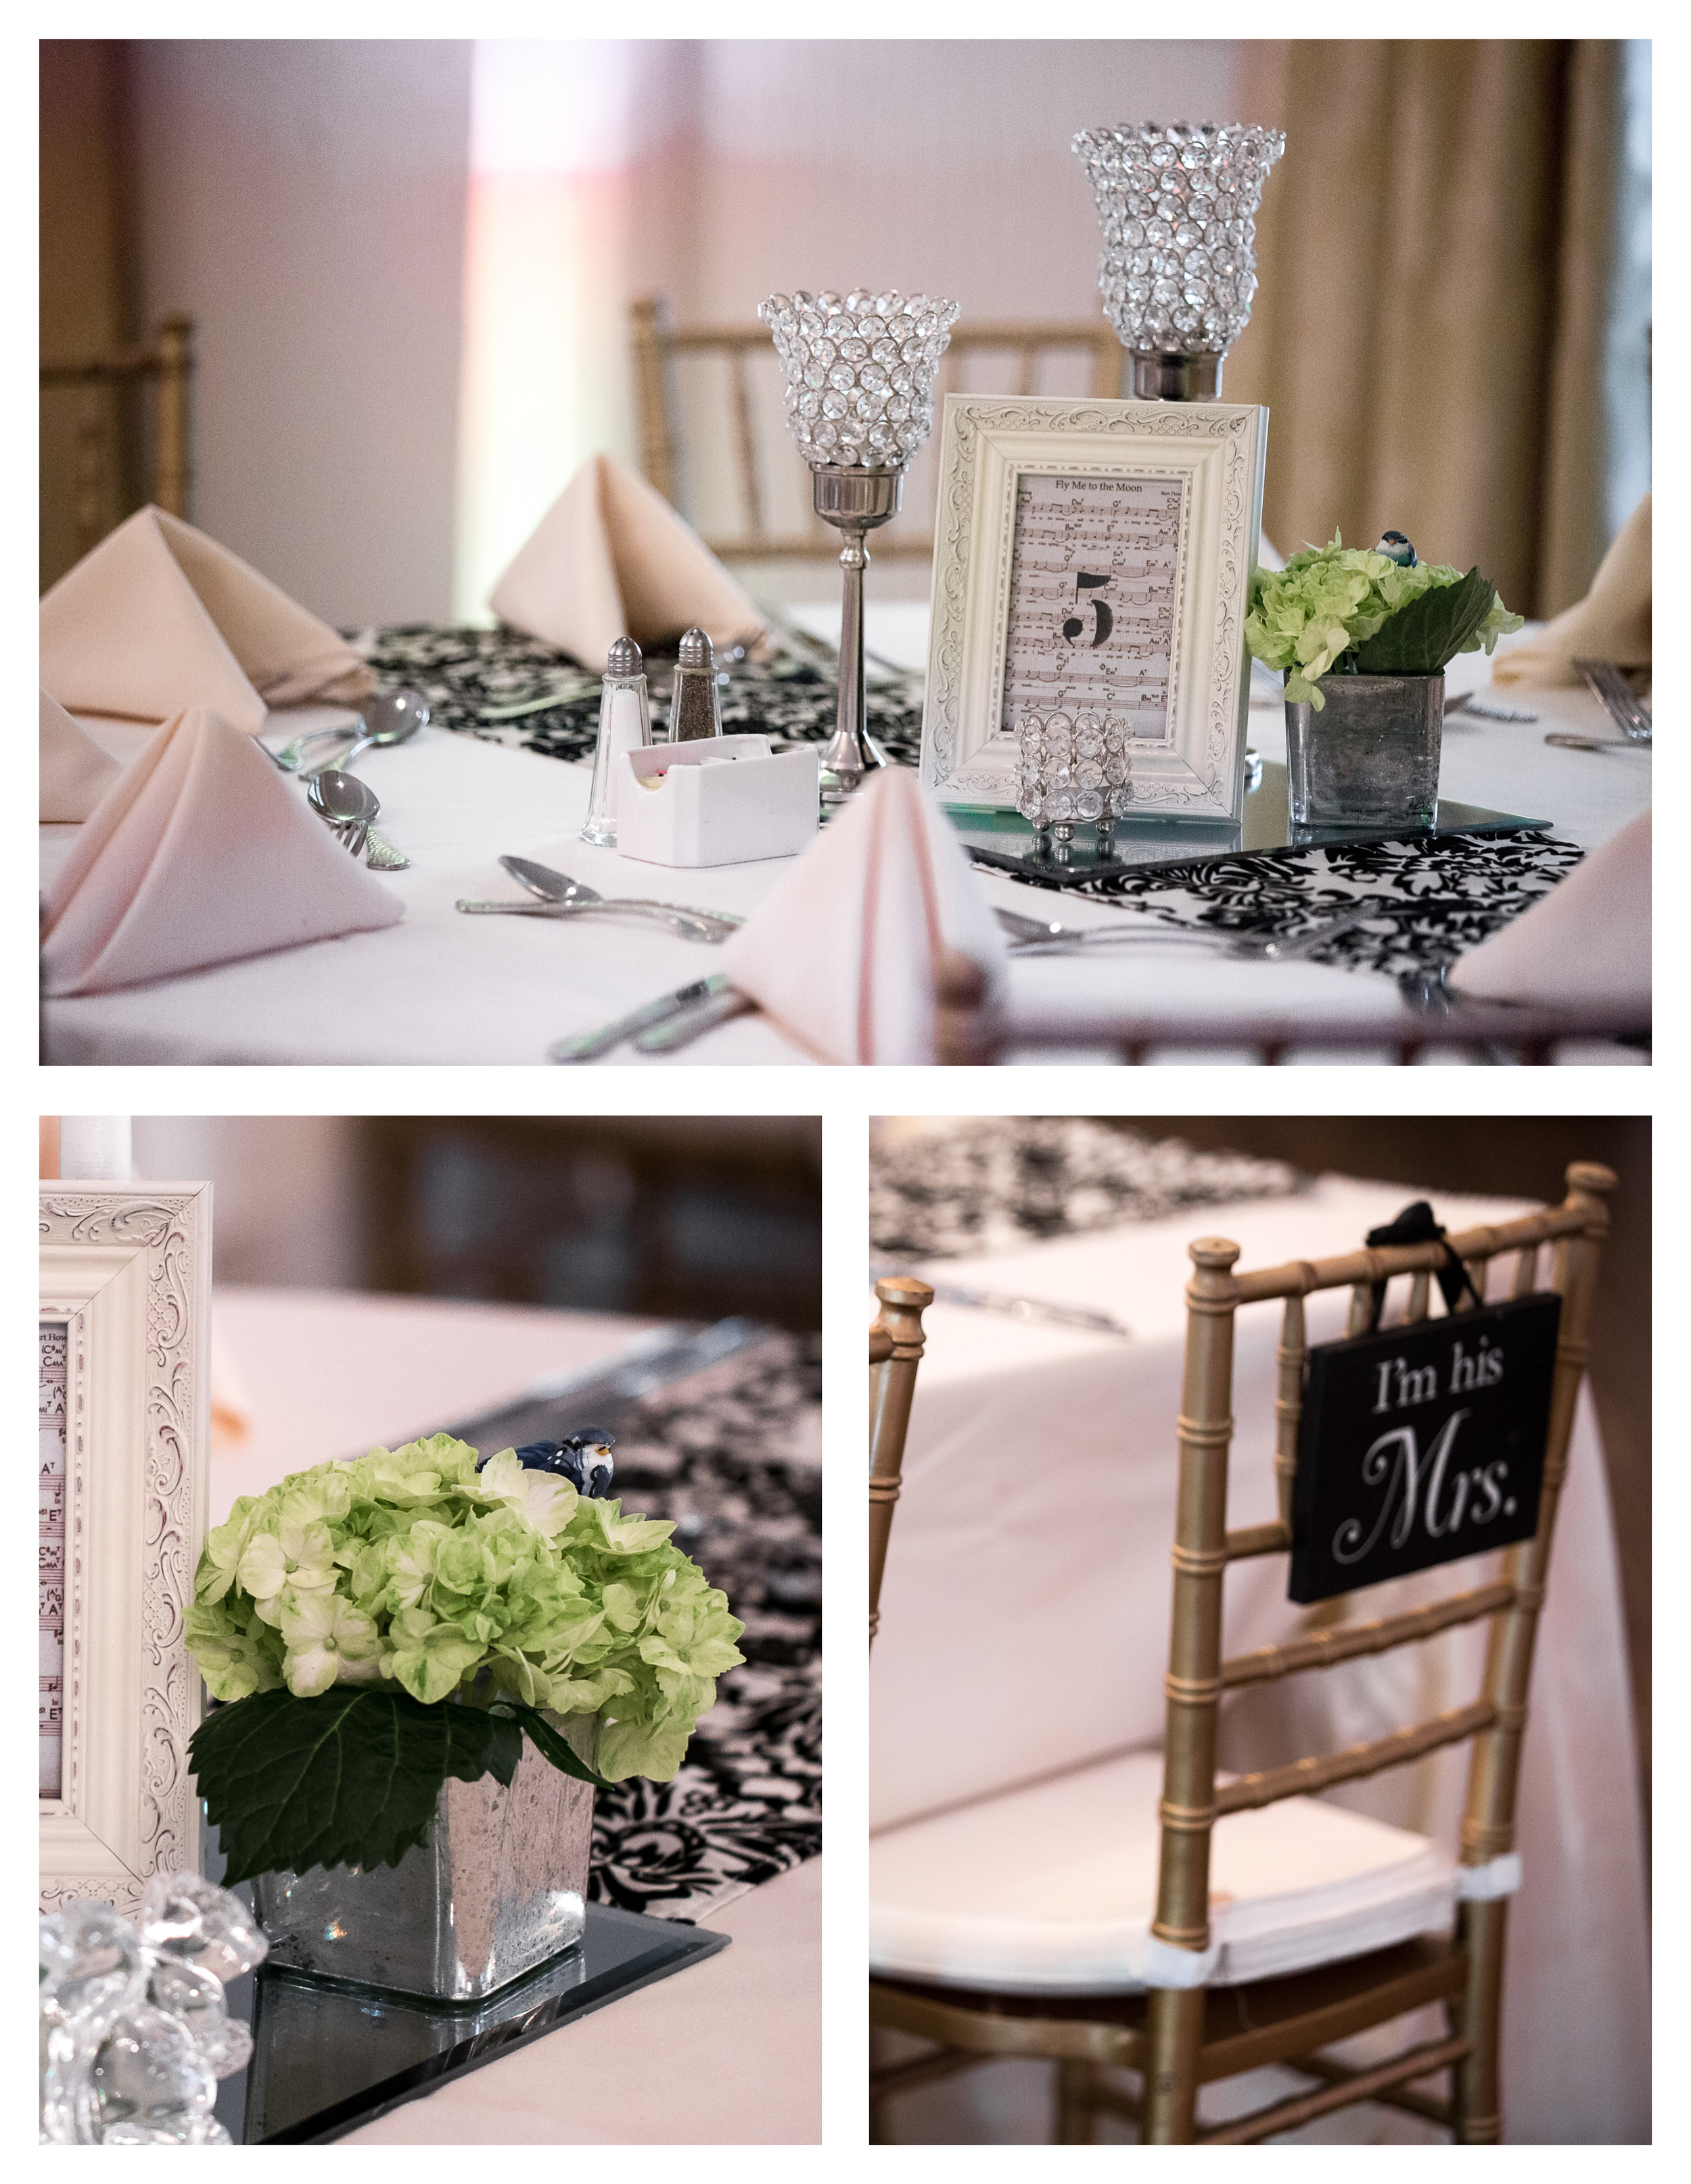 Highland_Manor_Apopka_Florida_wedding_Jackie_&_Tim_photography_jodi_Fjelde_photography-25.jpg